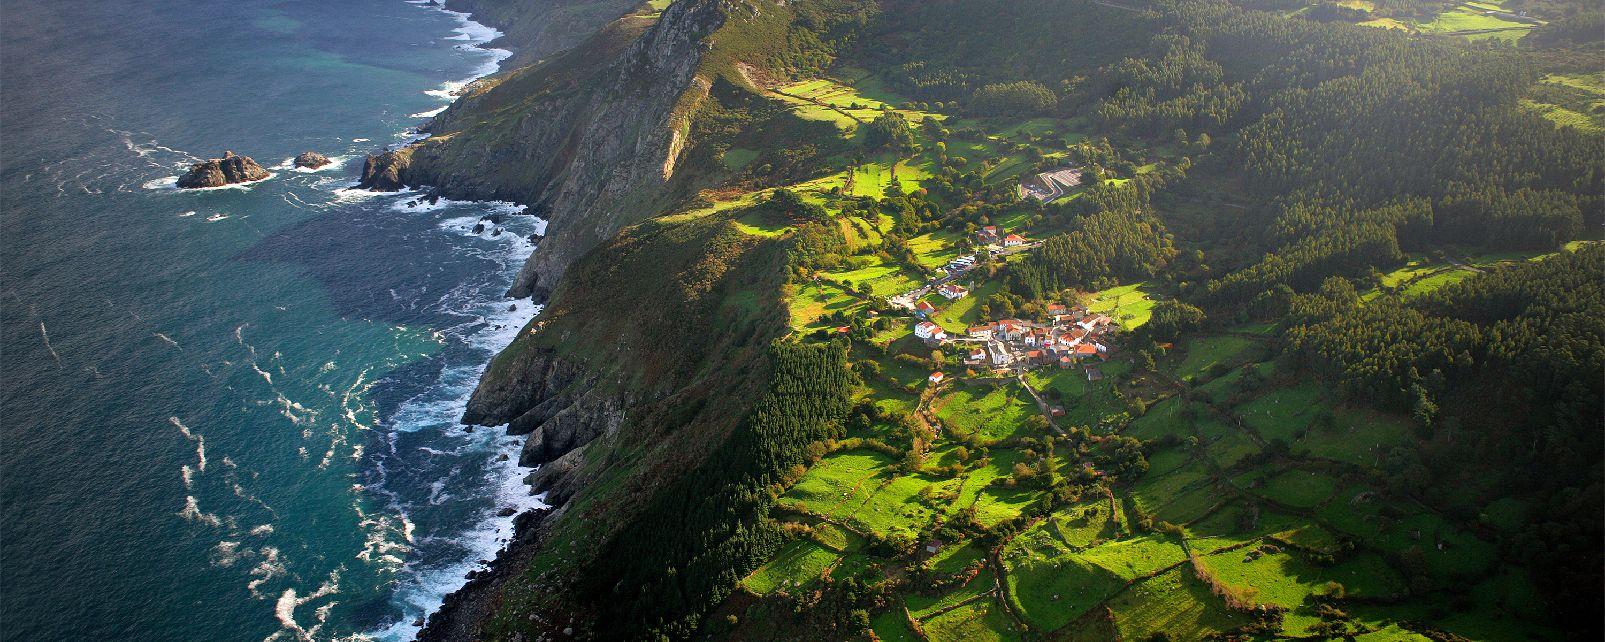 Visit Galicia Reasons To Go Easyvoyage